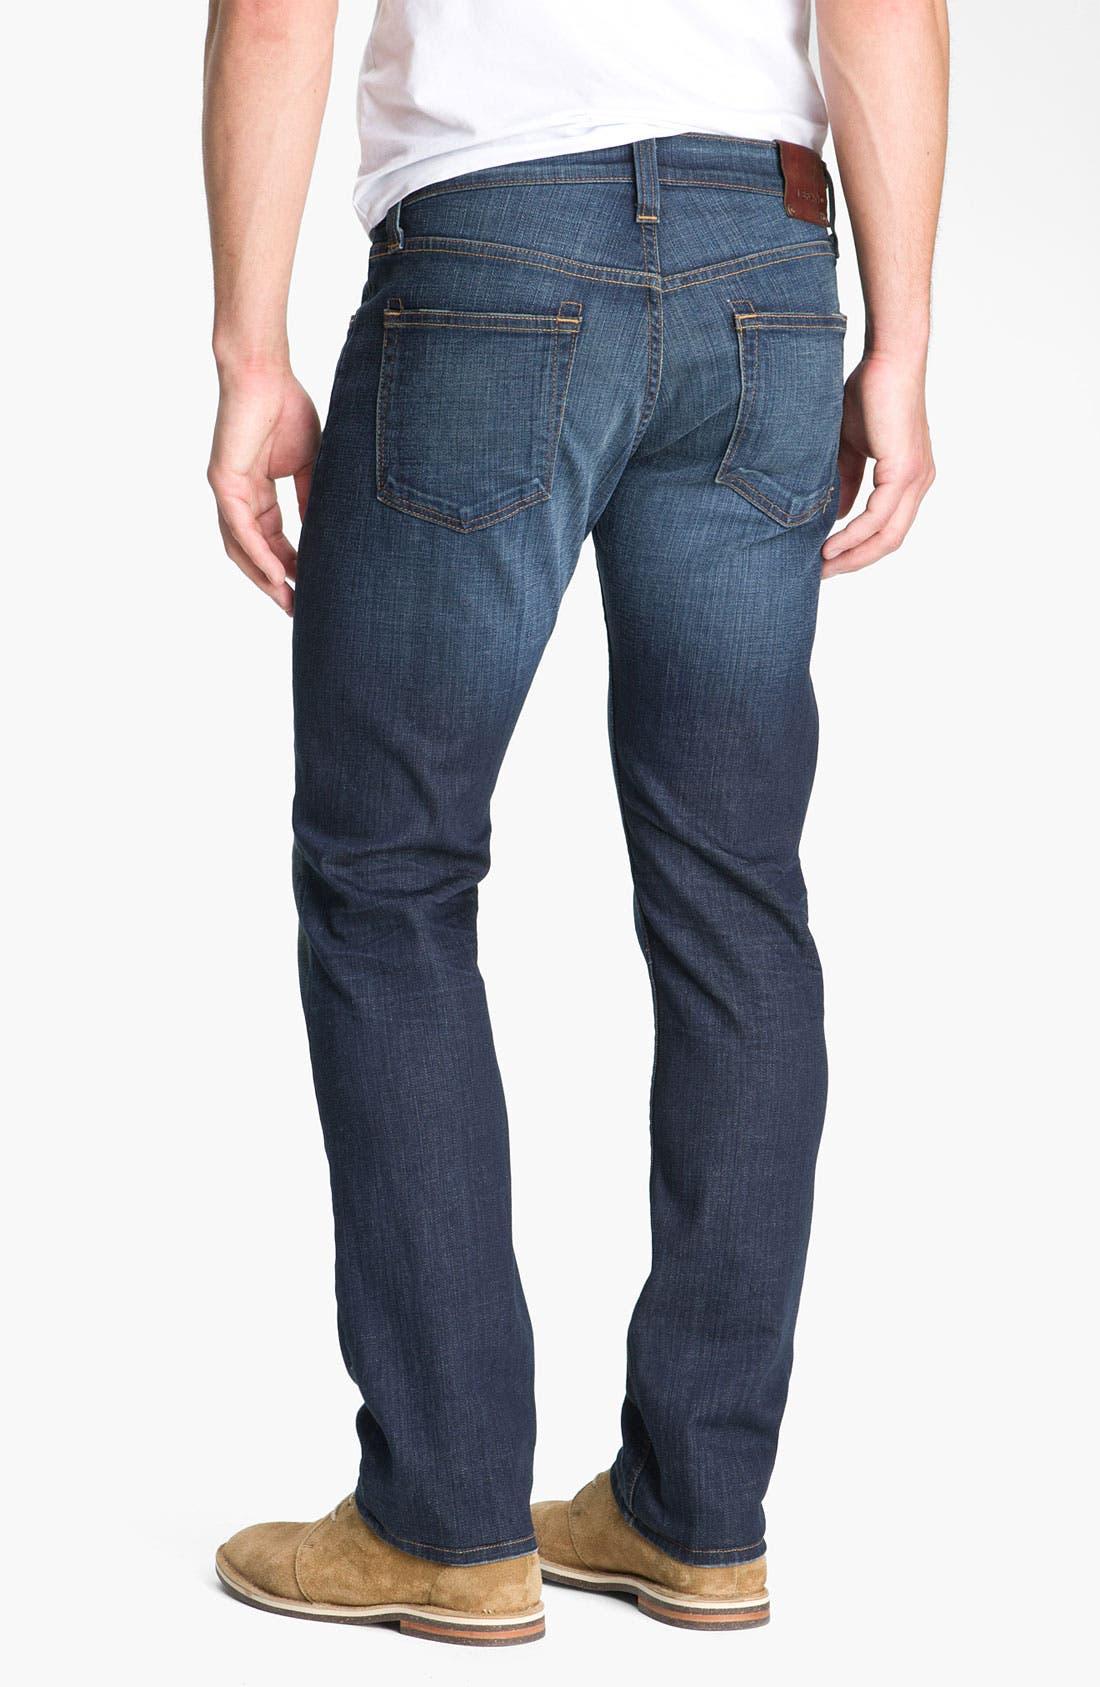 Alternate Image 1 Selected - J Brand 'Kane' Slim Straight Leg Jeans (Javelin)